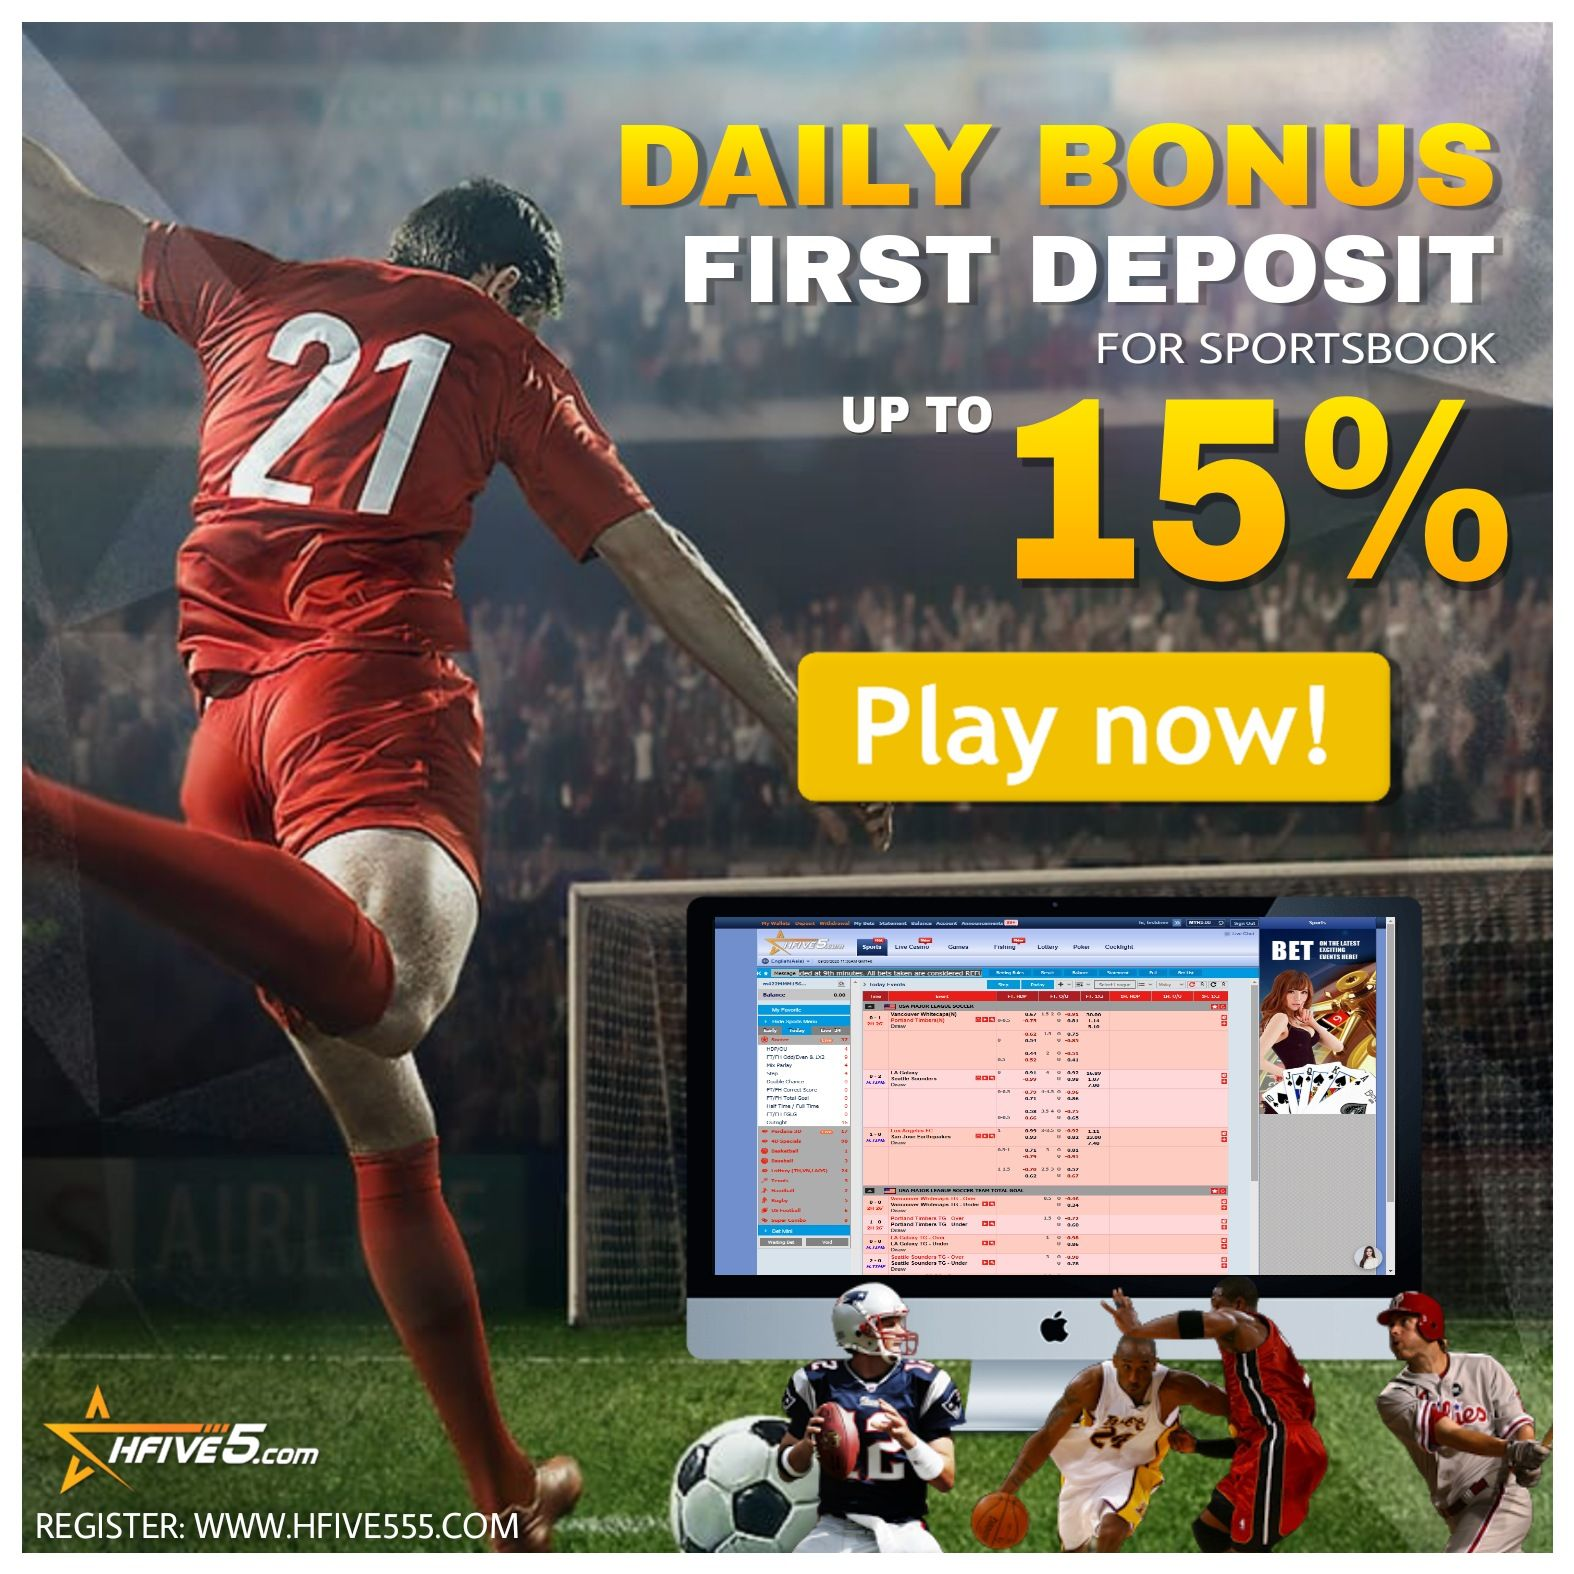 Sports betting bonus without deposit ladbrokes sports betting appeal update